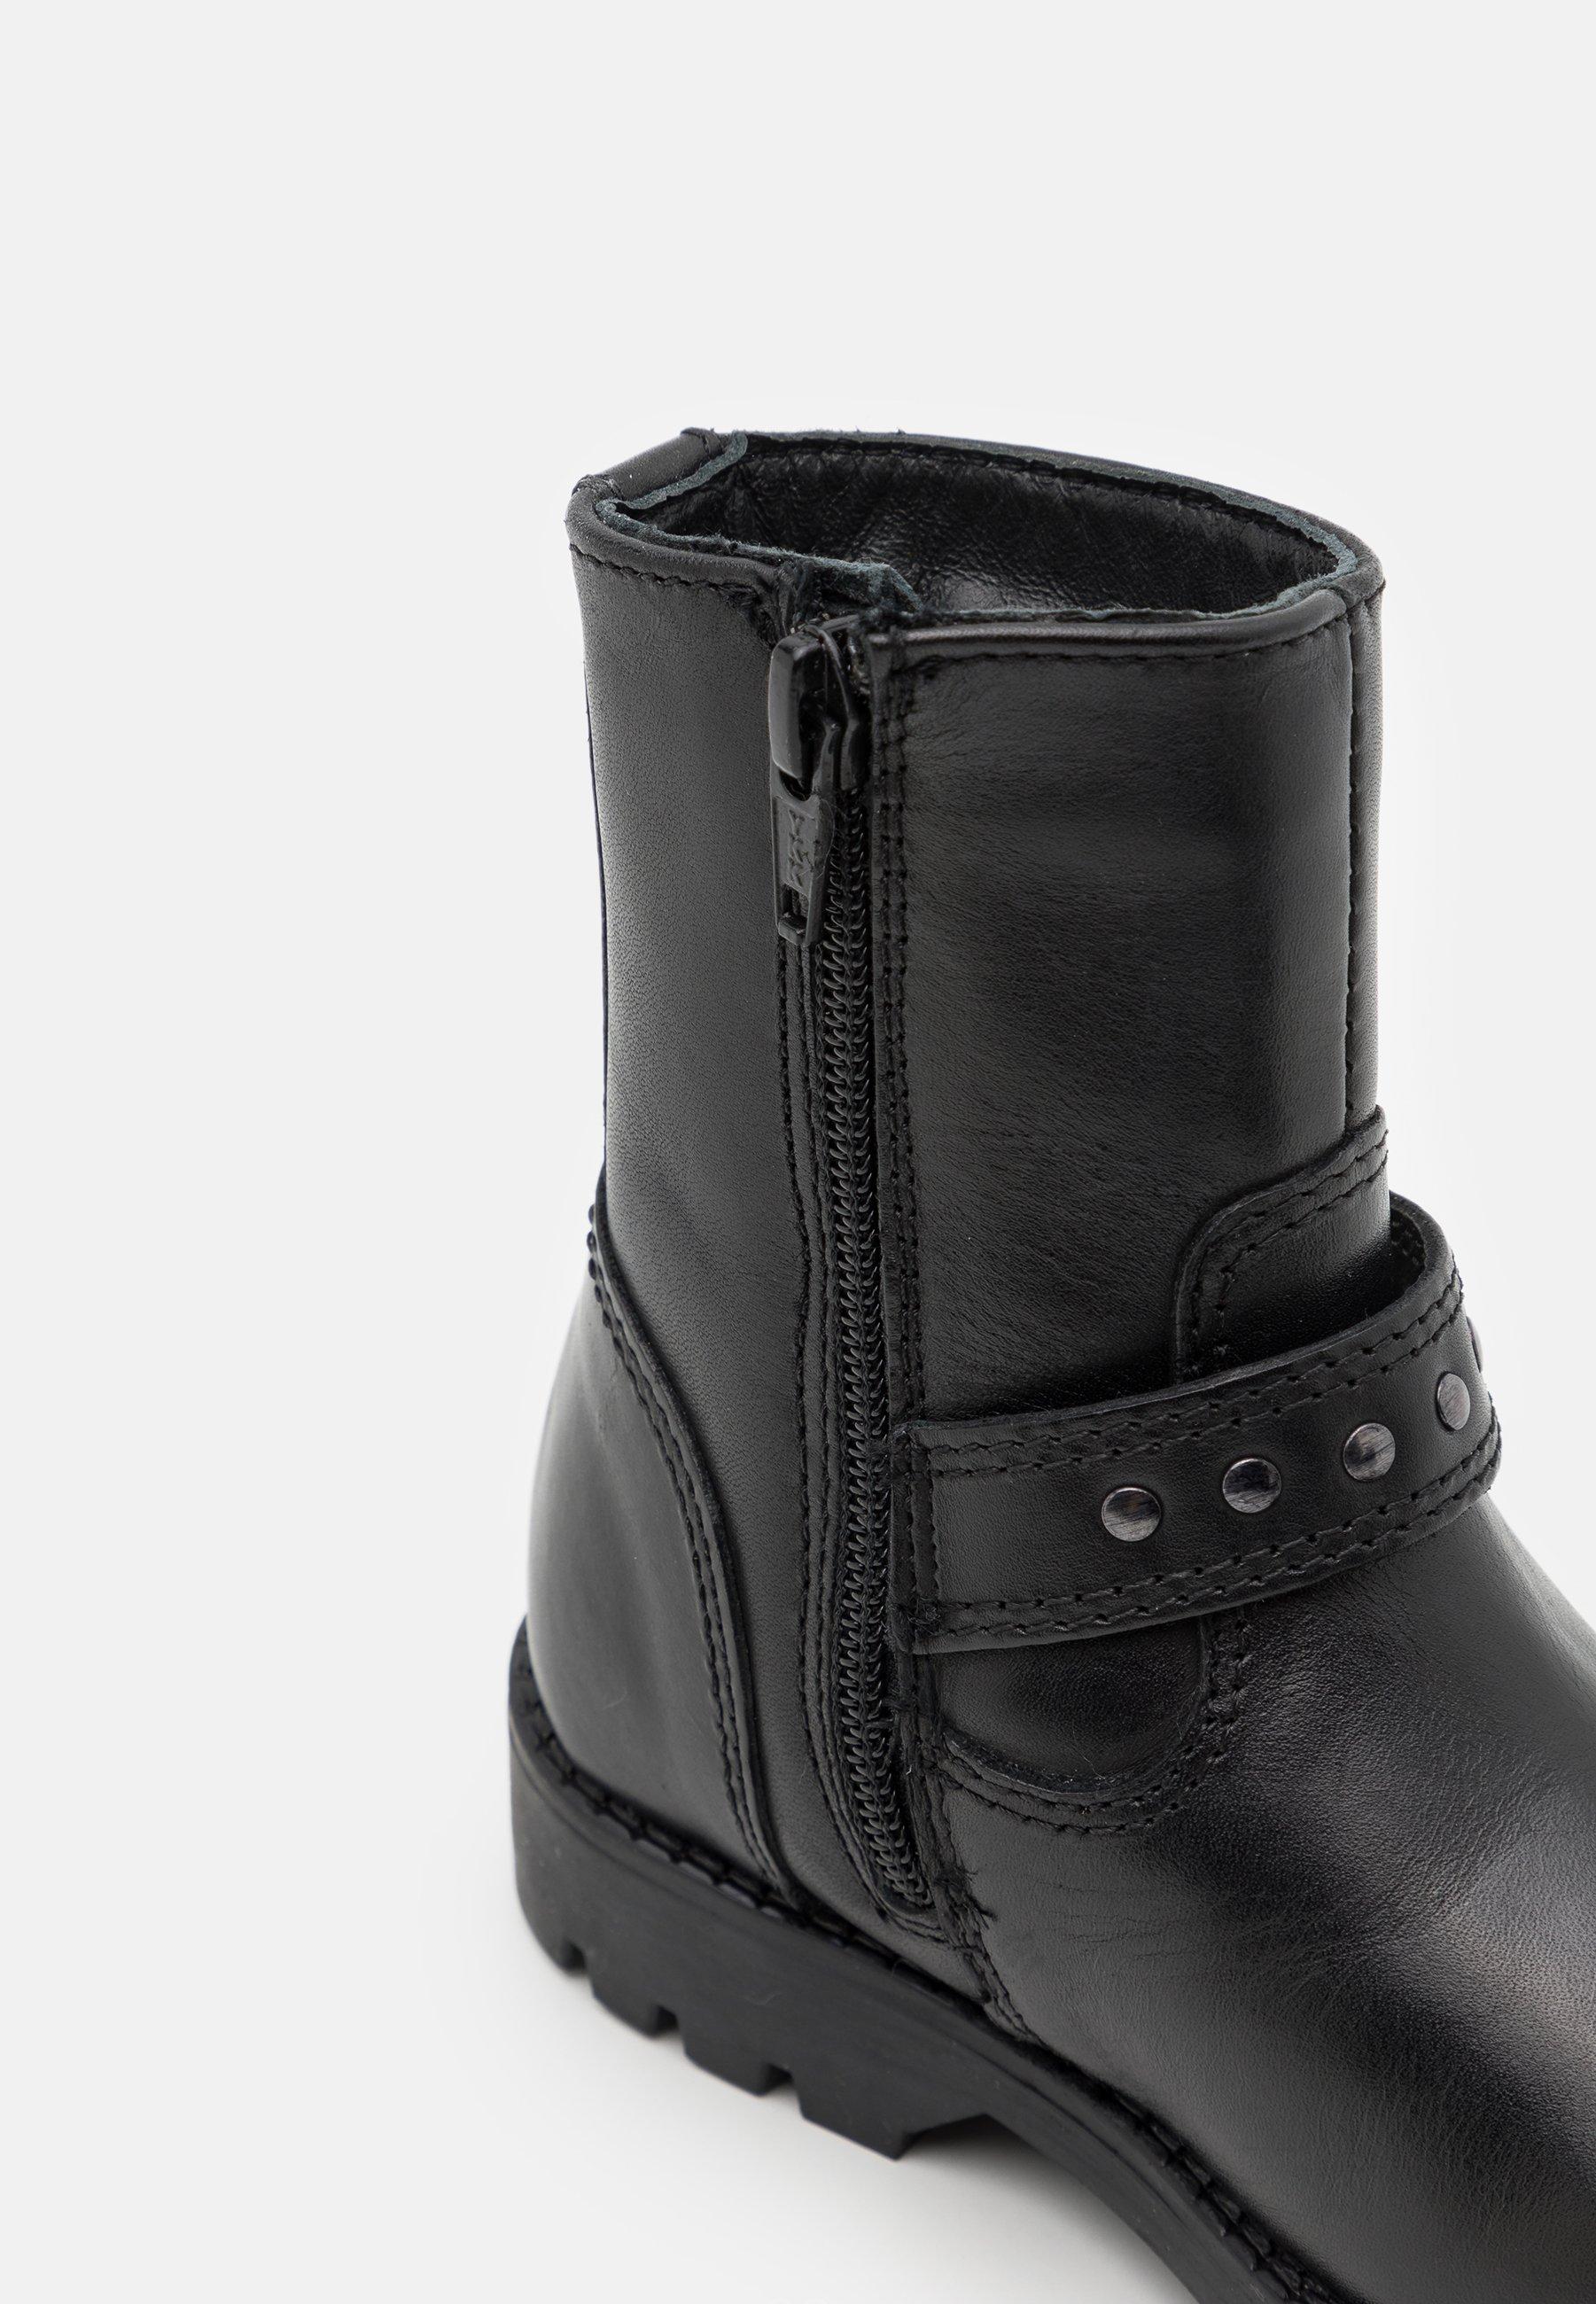 Kids Cowboy/biker ankle boot